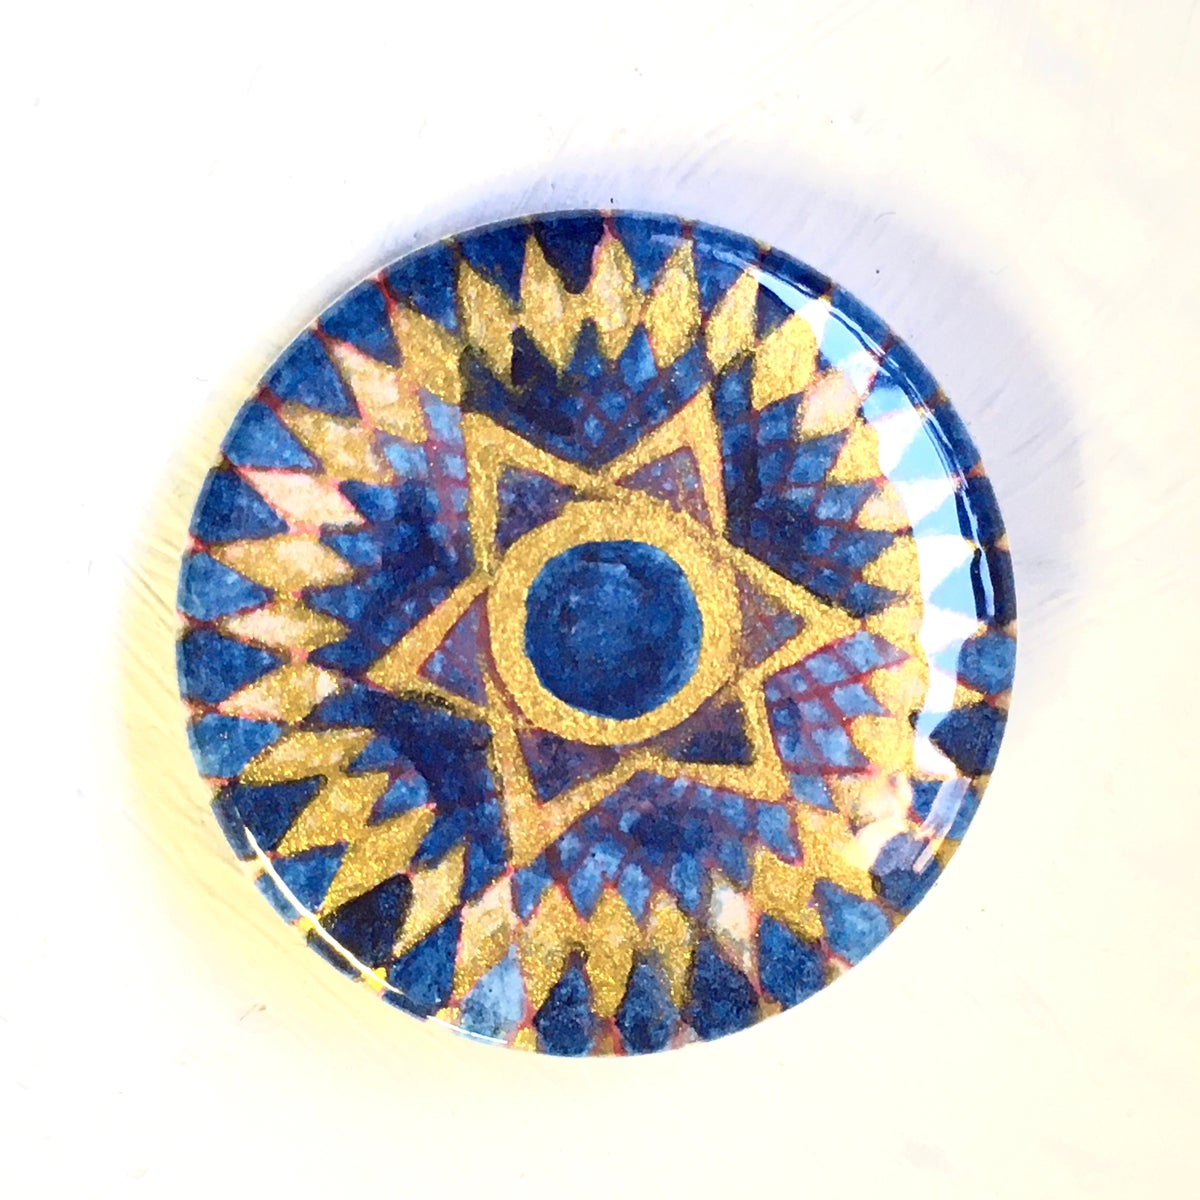 Image of Orbit Button #4